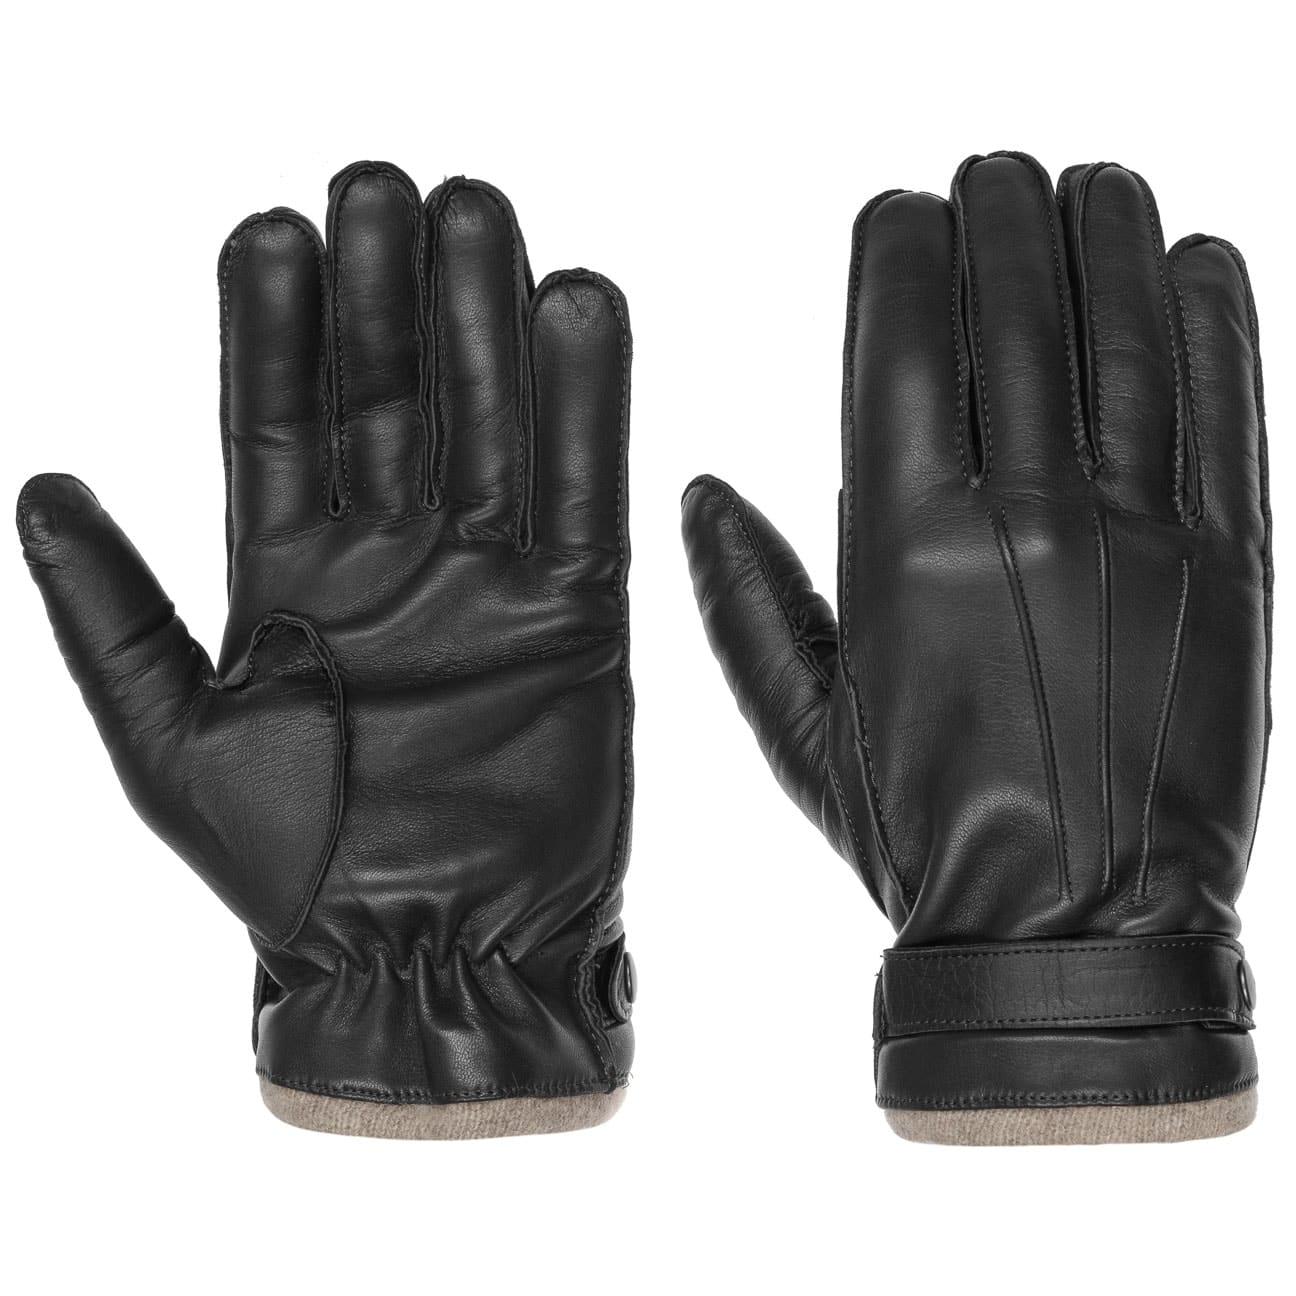 Gants pour Homme Cuir Nappa Naples by Caridei  gants en cuir